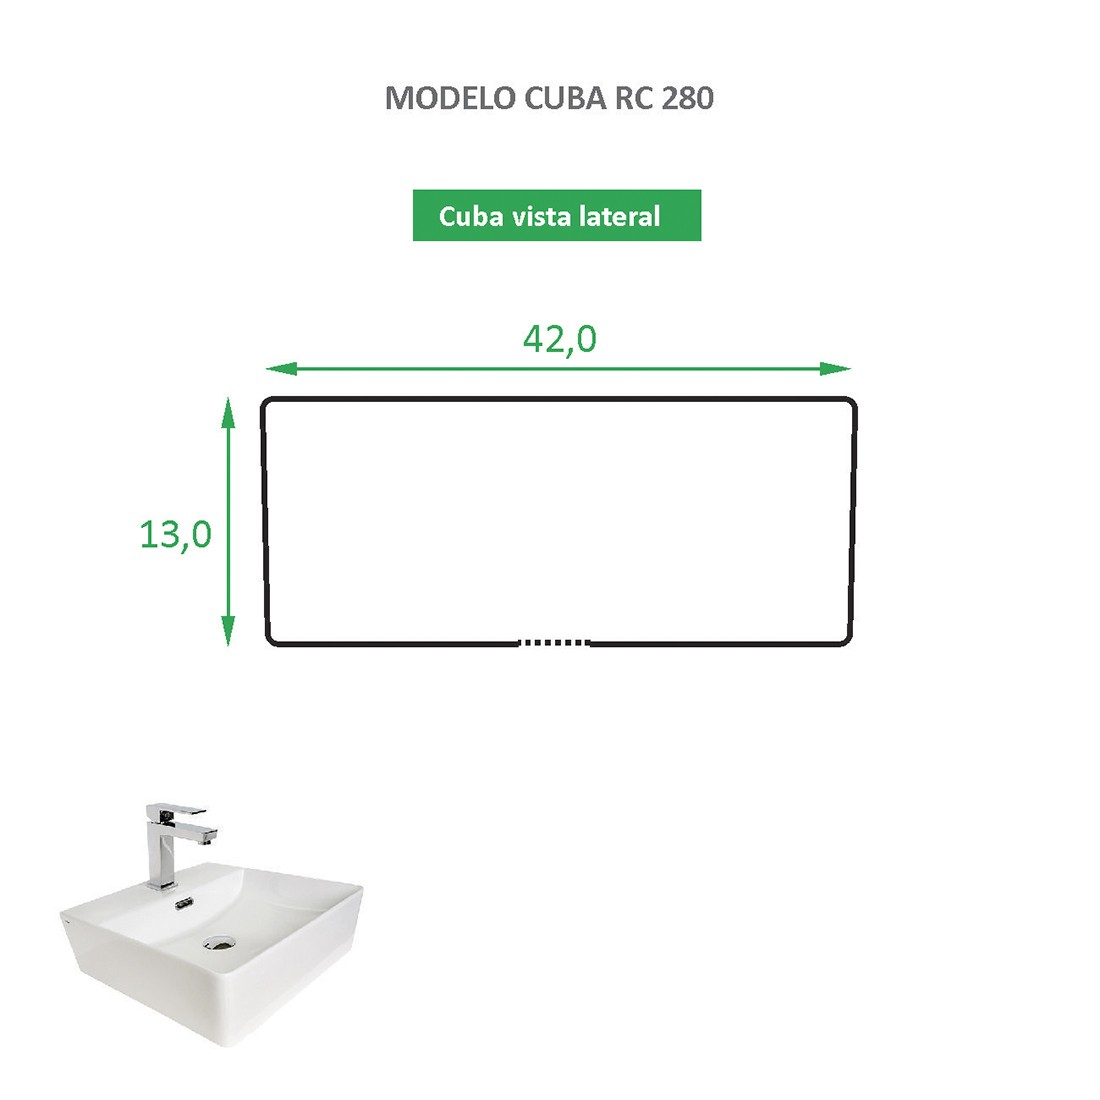 Cuba de Apoio Cerâmica Reno RC 280 Novidade!